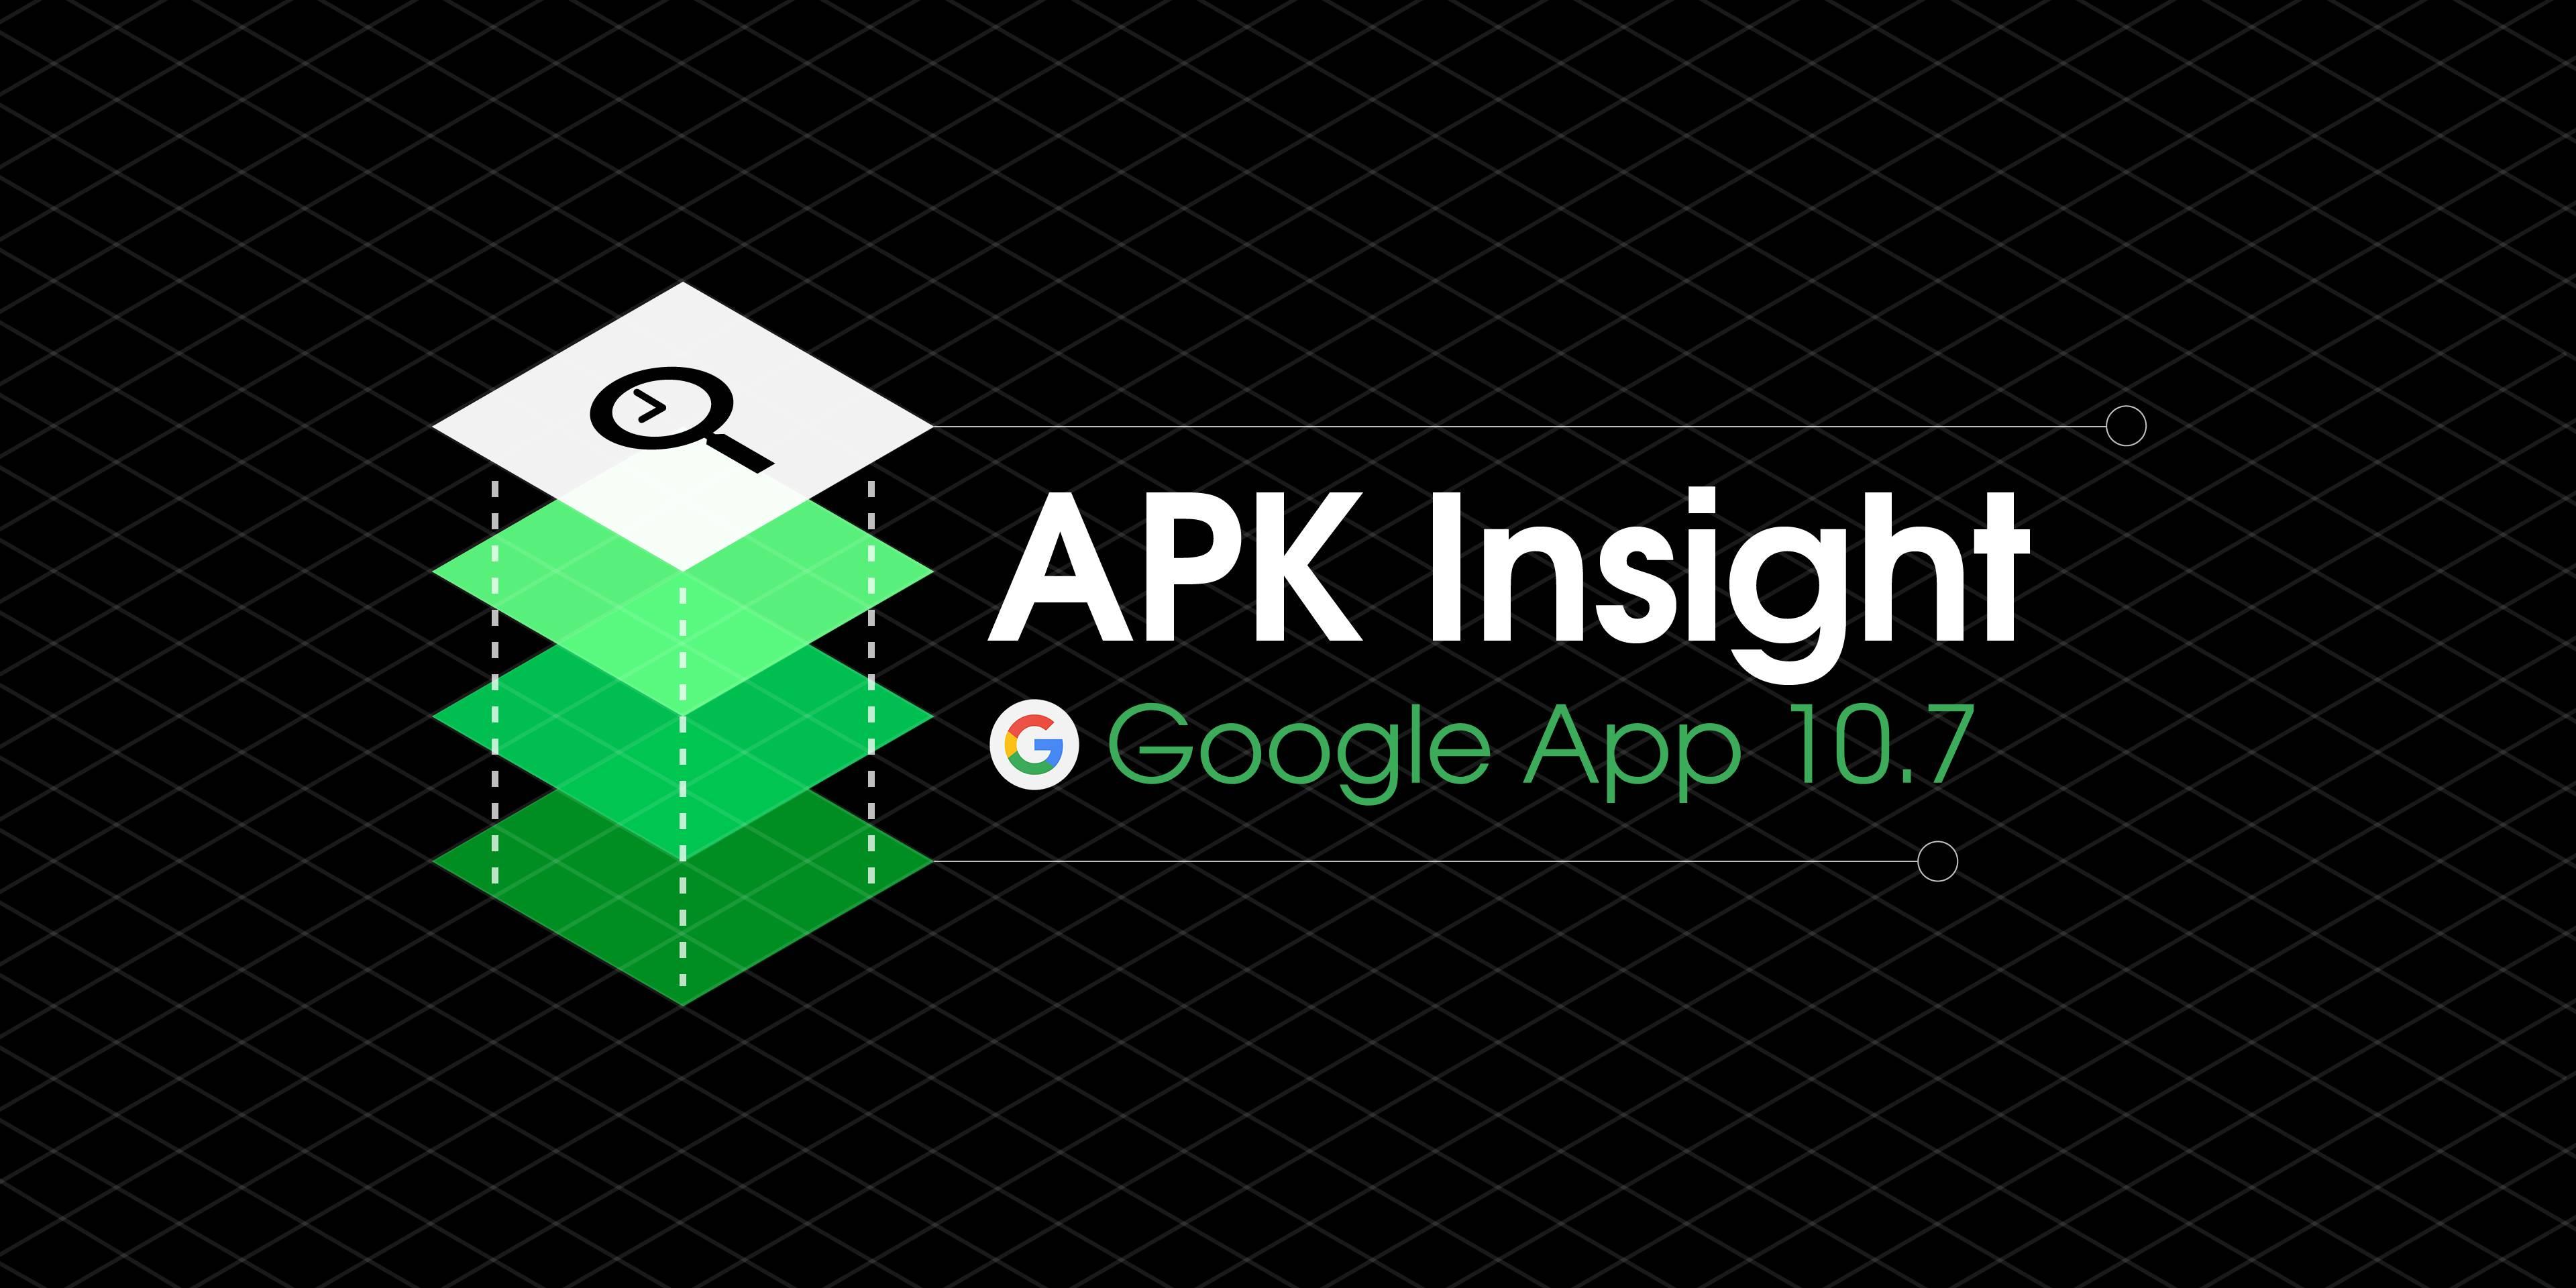 Google App 10.7 fügt skurrile Face Match-Animationen hinzu [APK Insight]